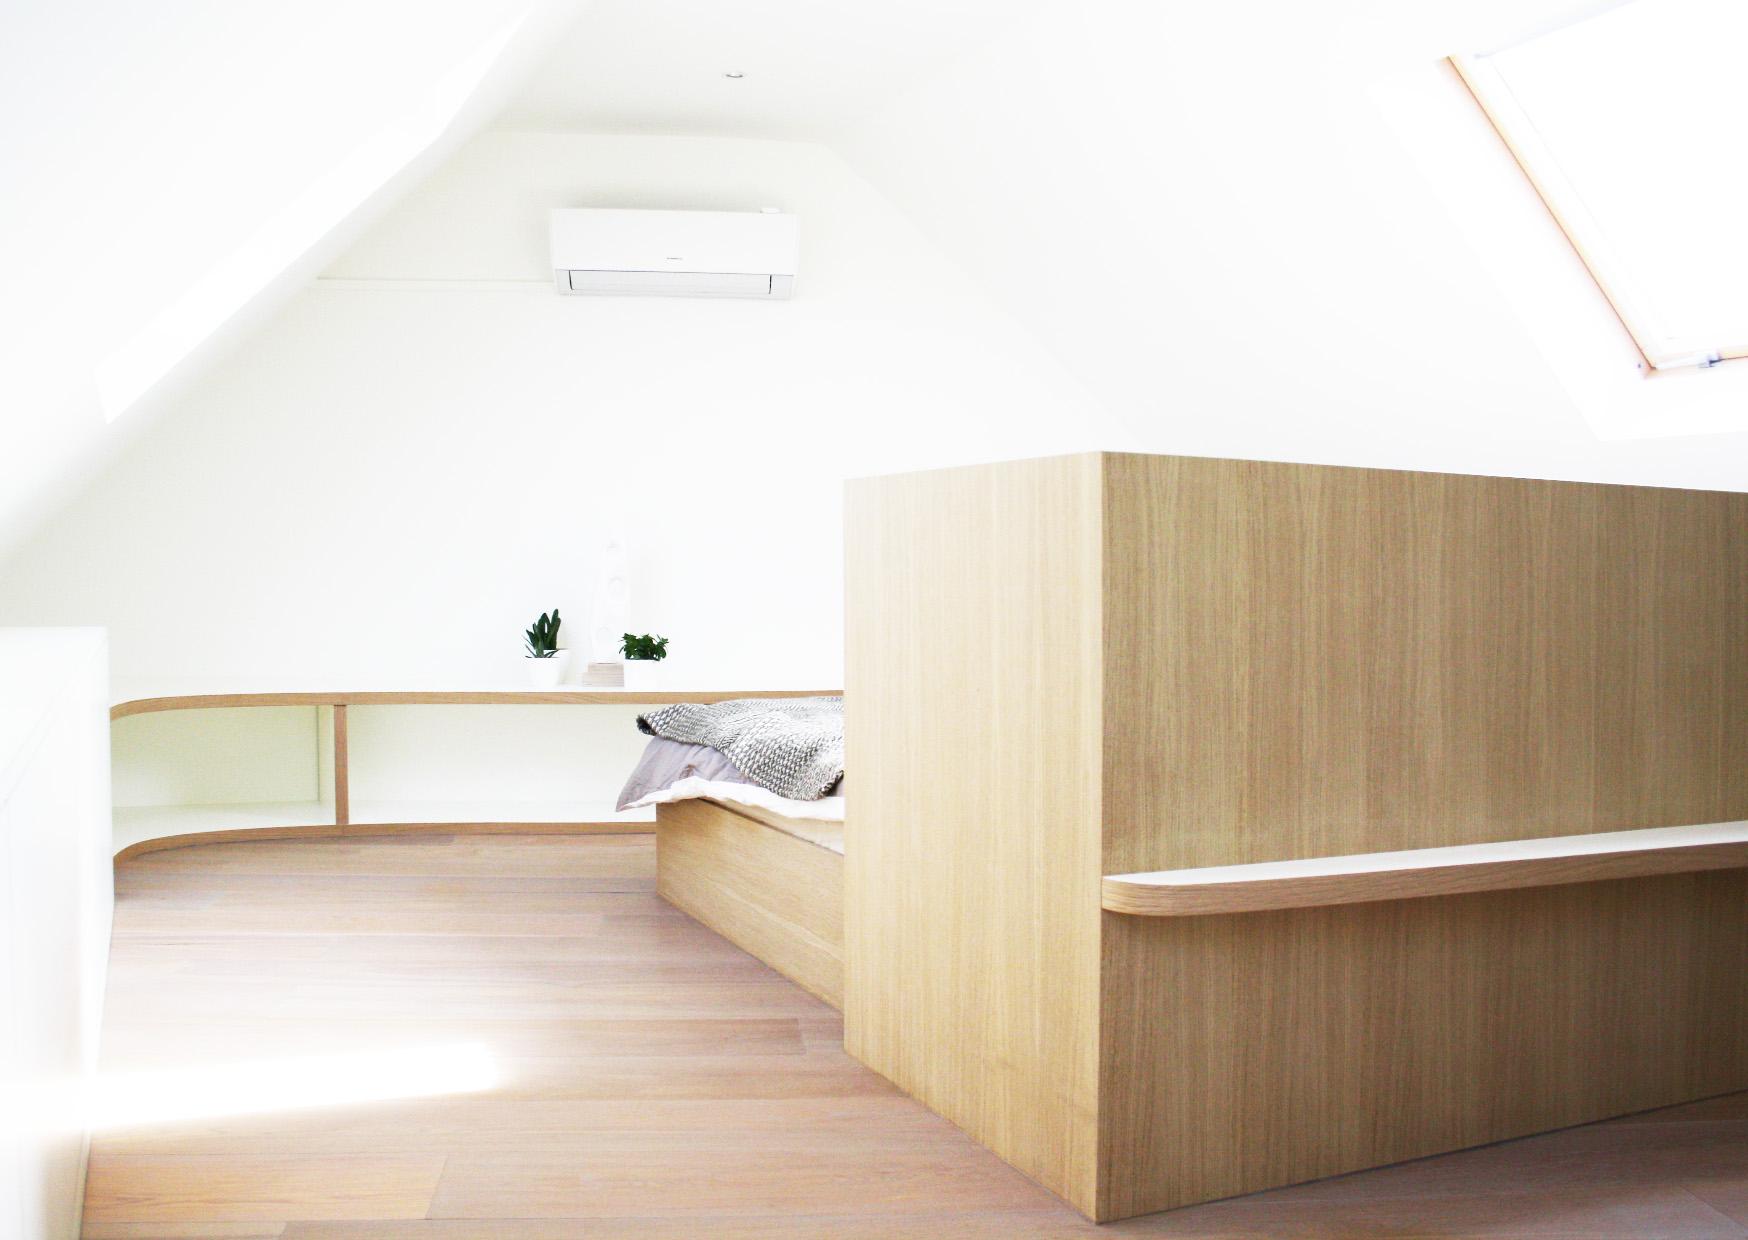 interieur_zolder_slaapkamer.jpg